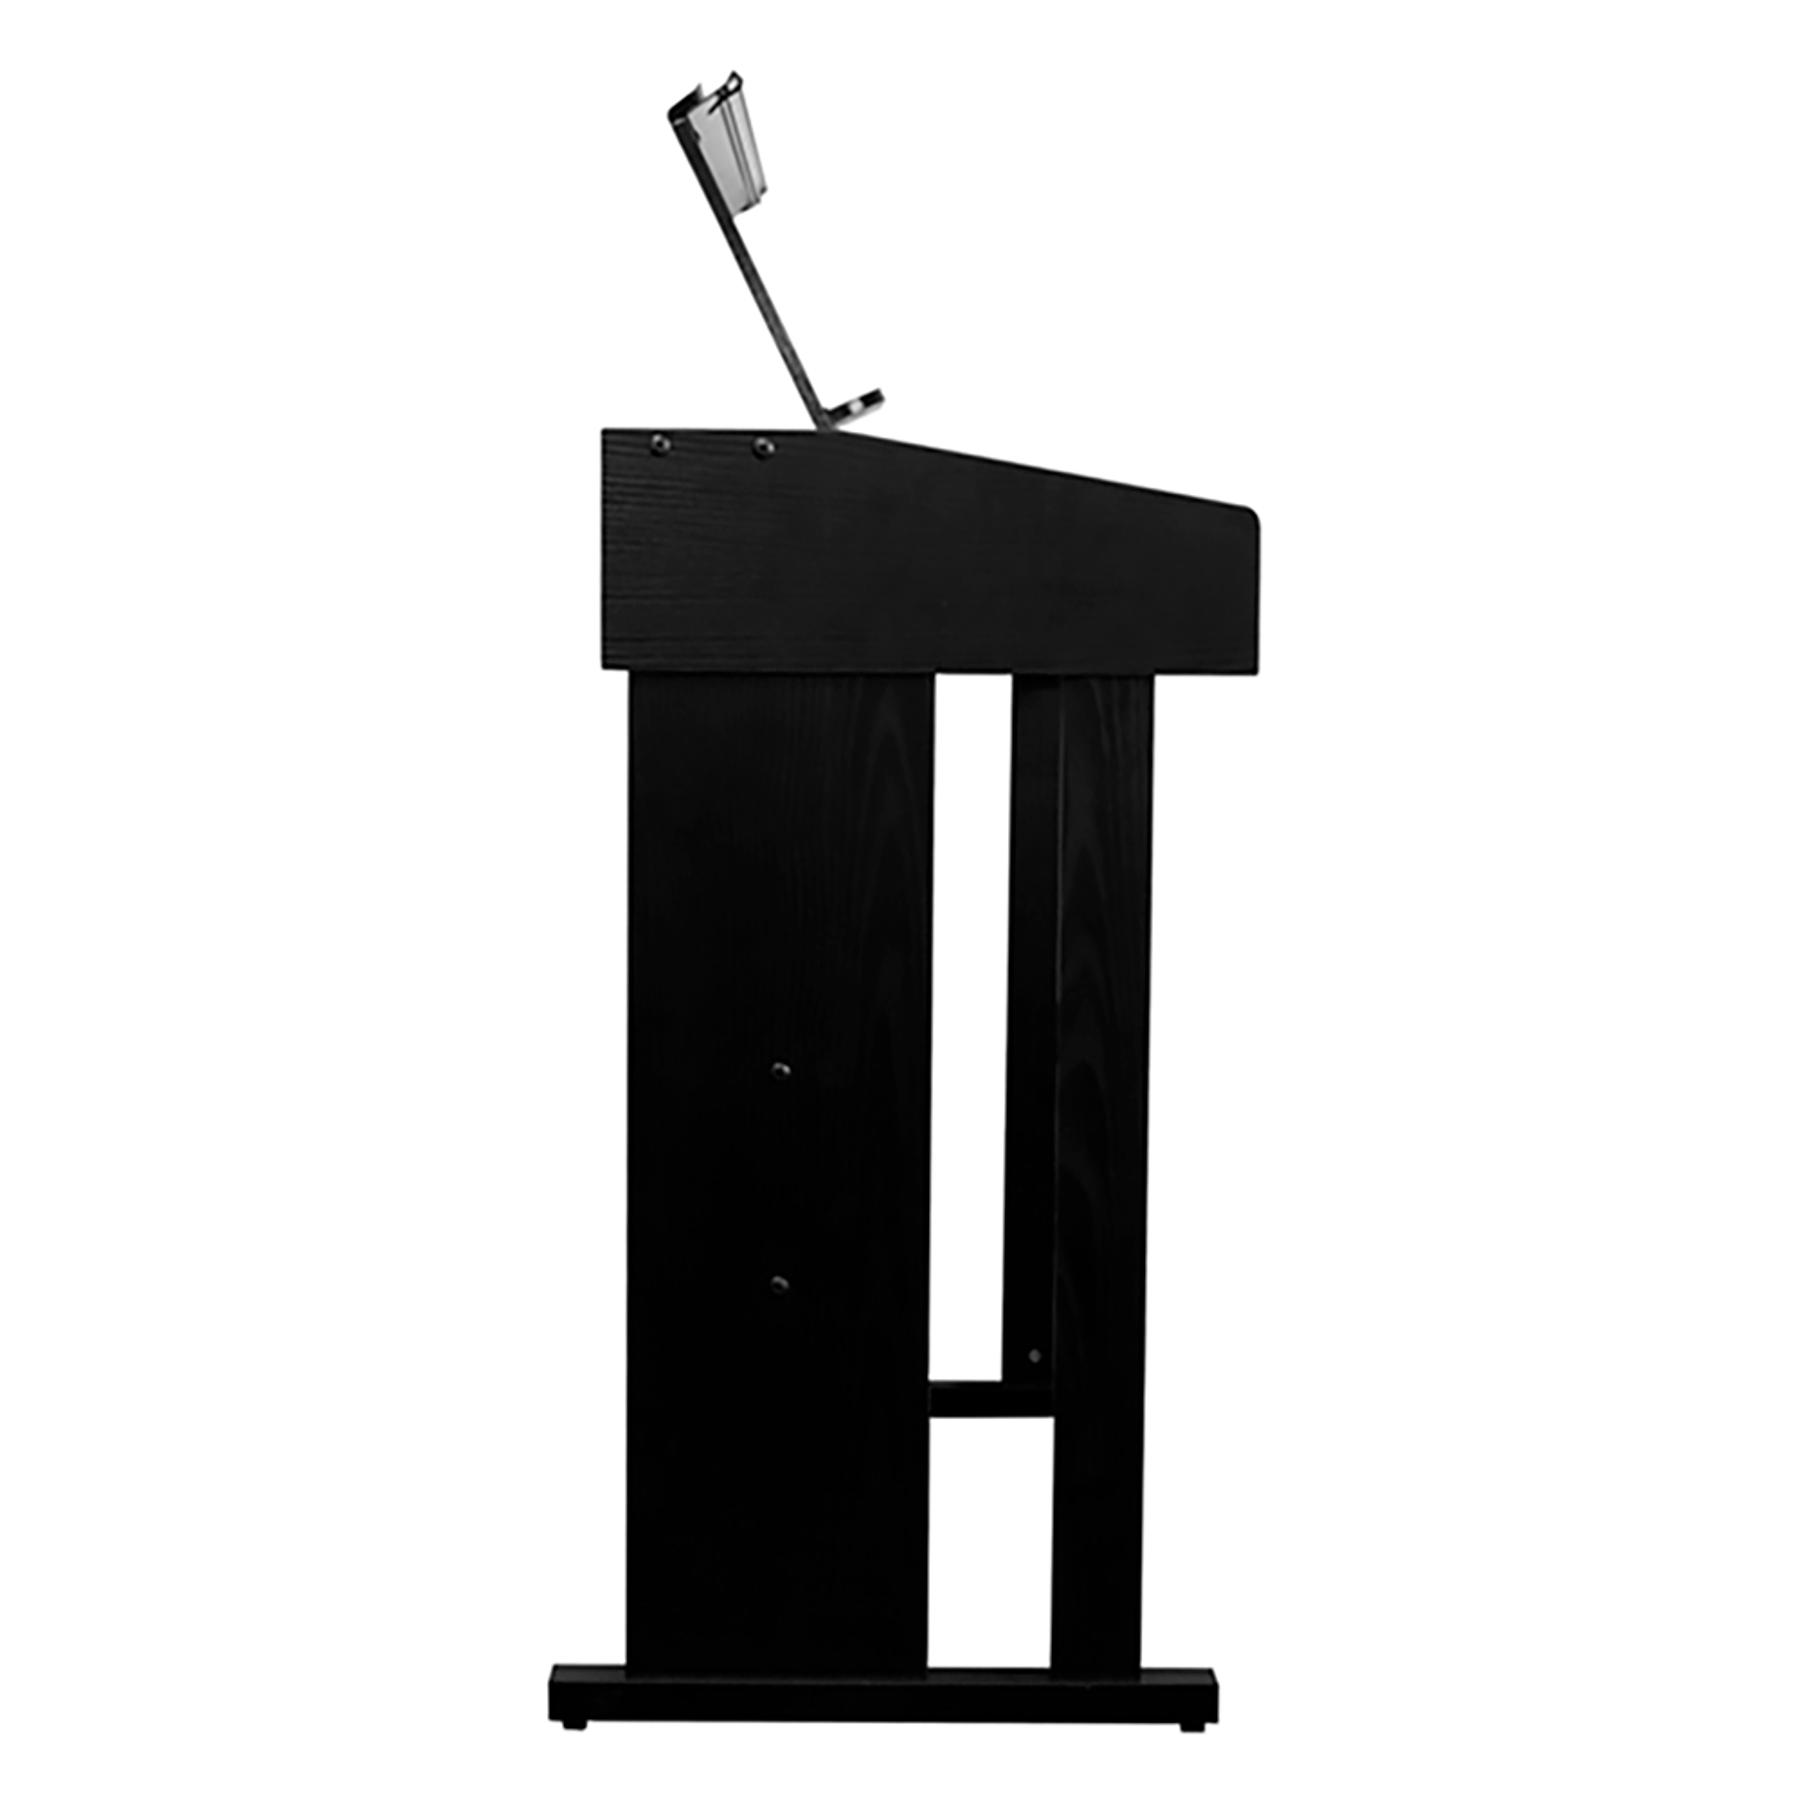 Órgano Electrónico Con Mueble Bontempi Negro